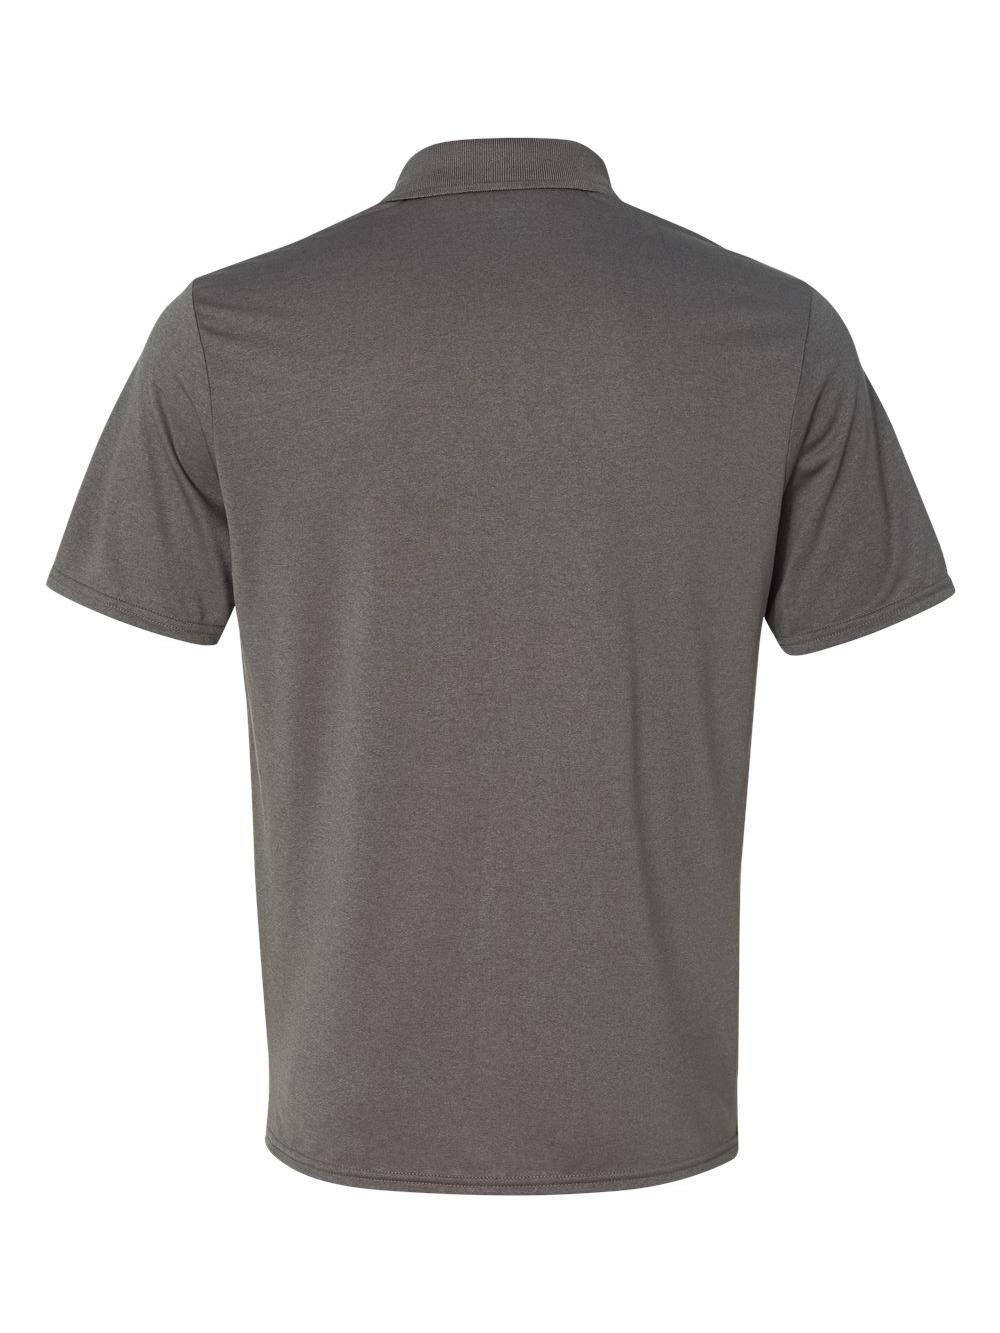 Gildan-Performance-Jersey-Sport-Shirt-44800 thumbnail 7